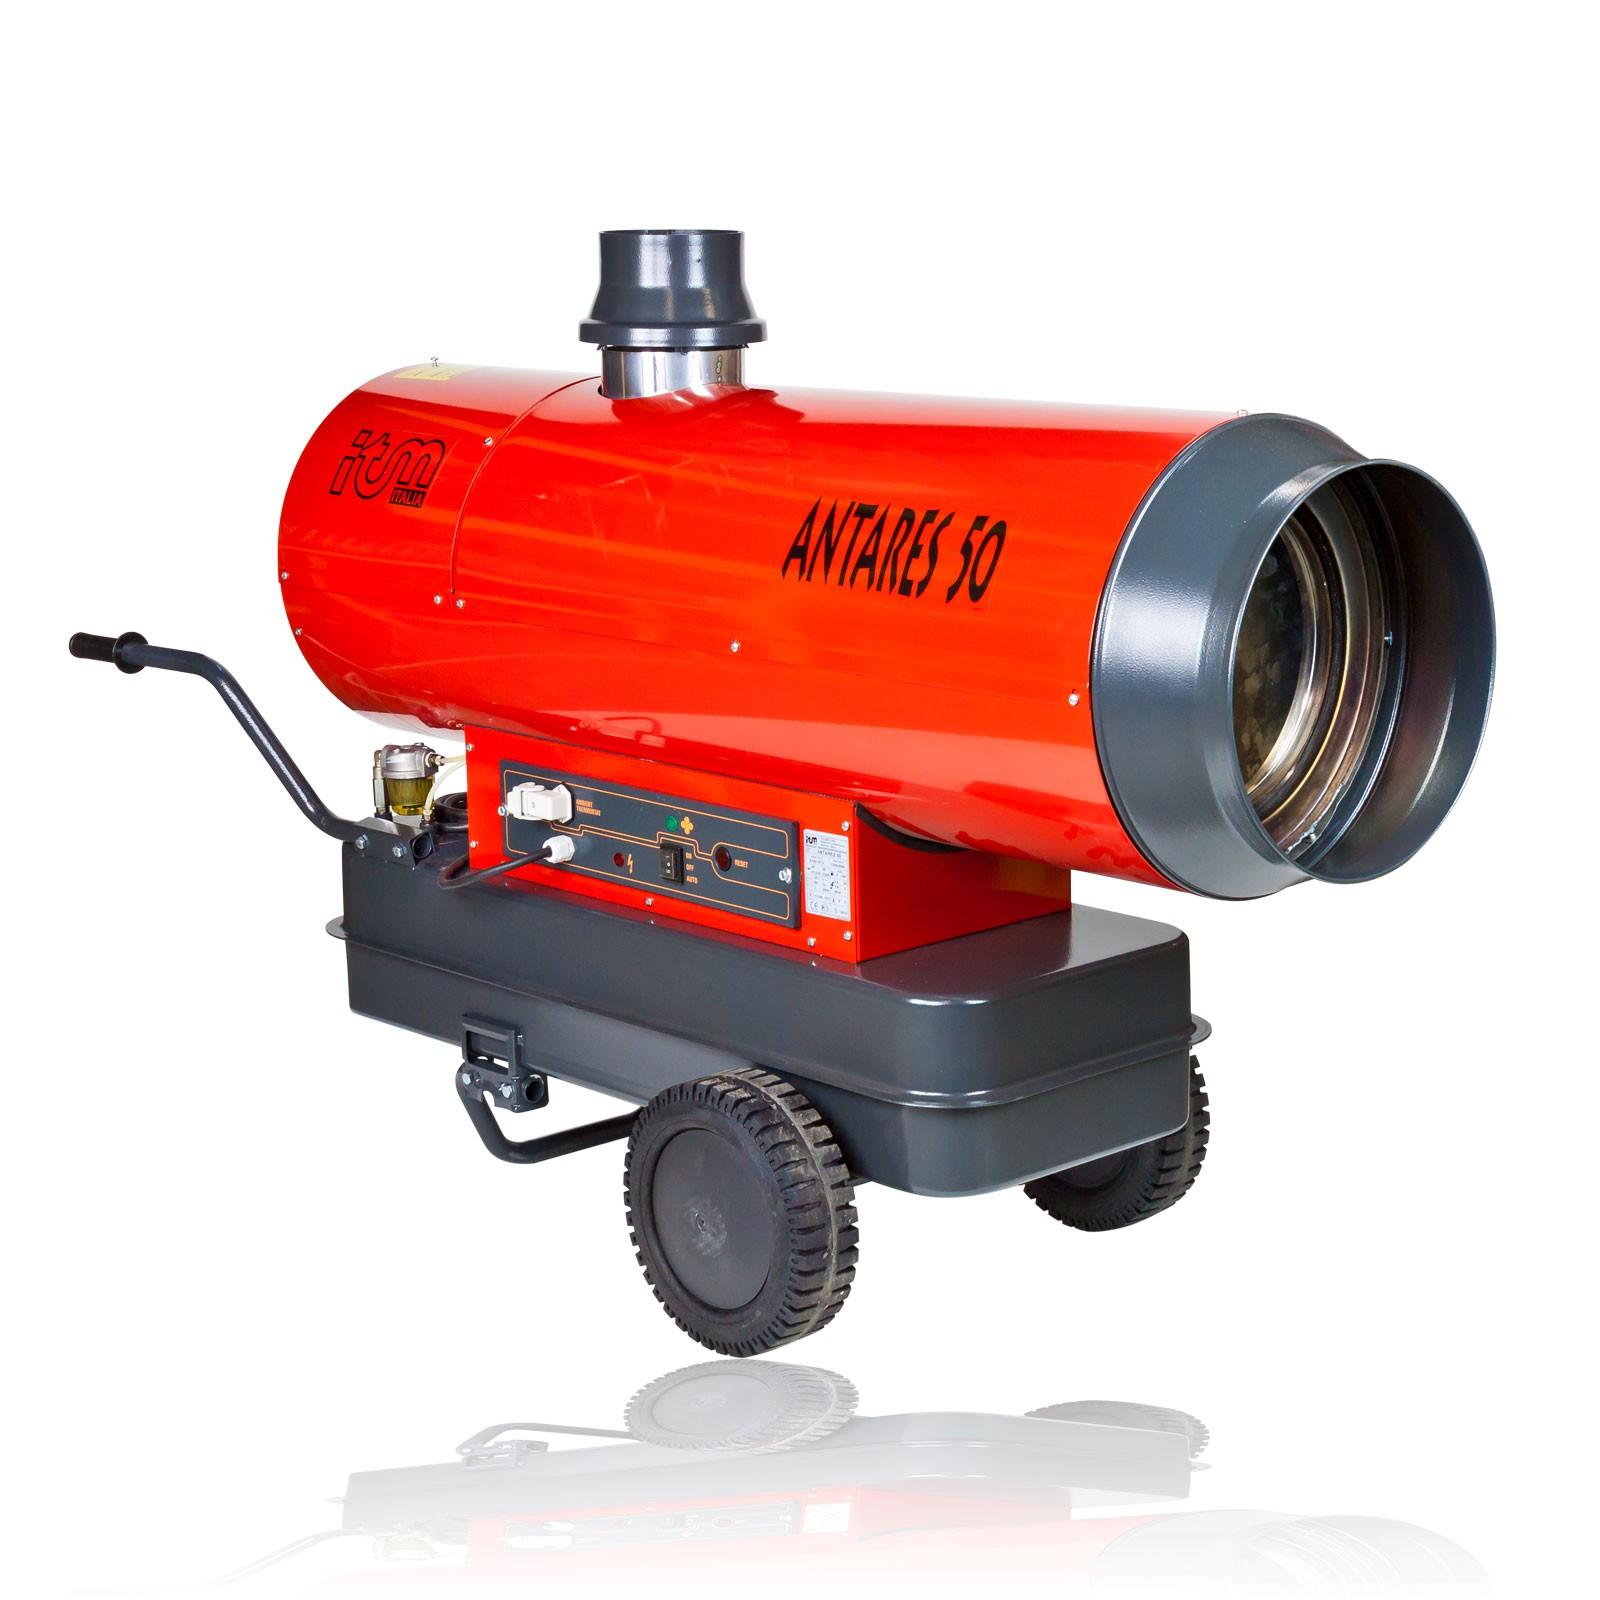 Ölheizgerät Antares 30 Diesel Heizkanone 30kW Heizgebläse